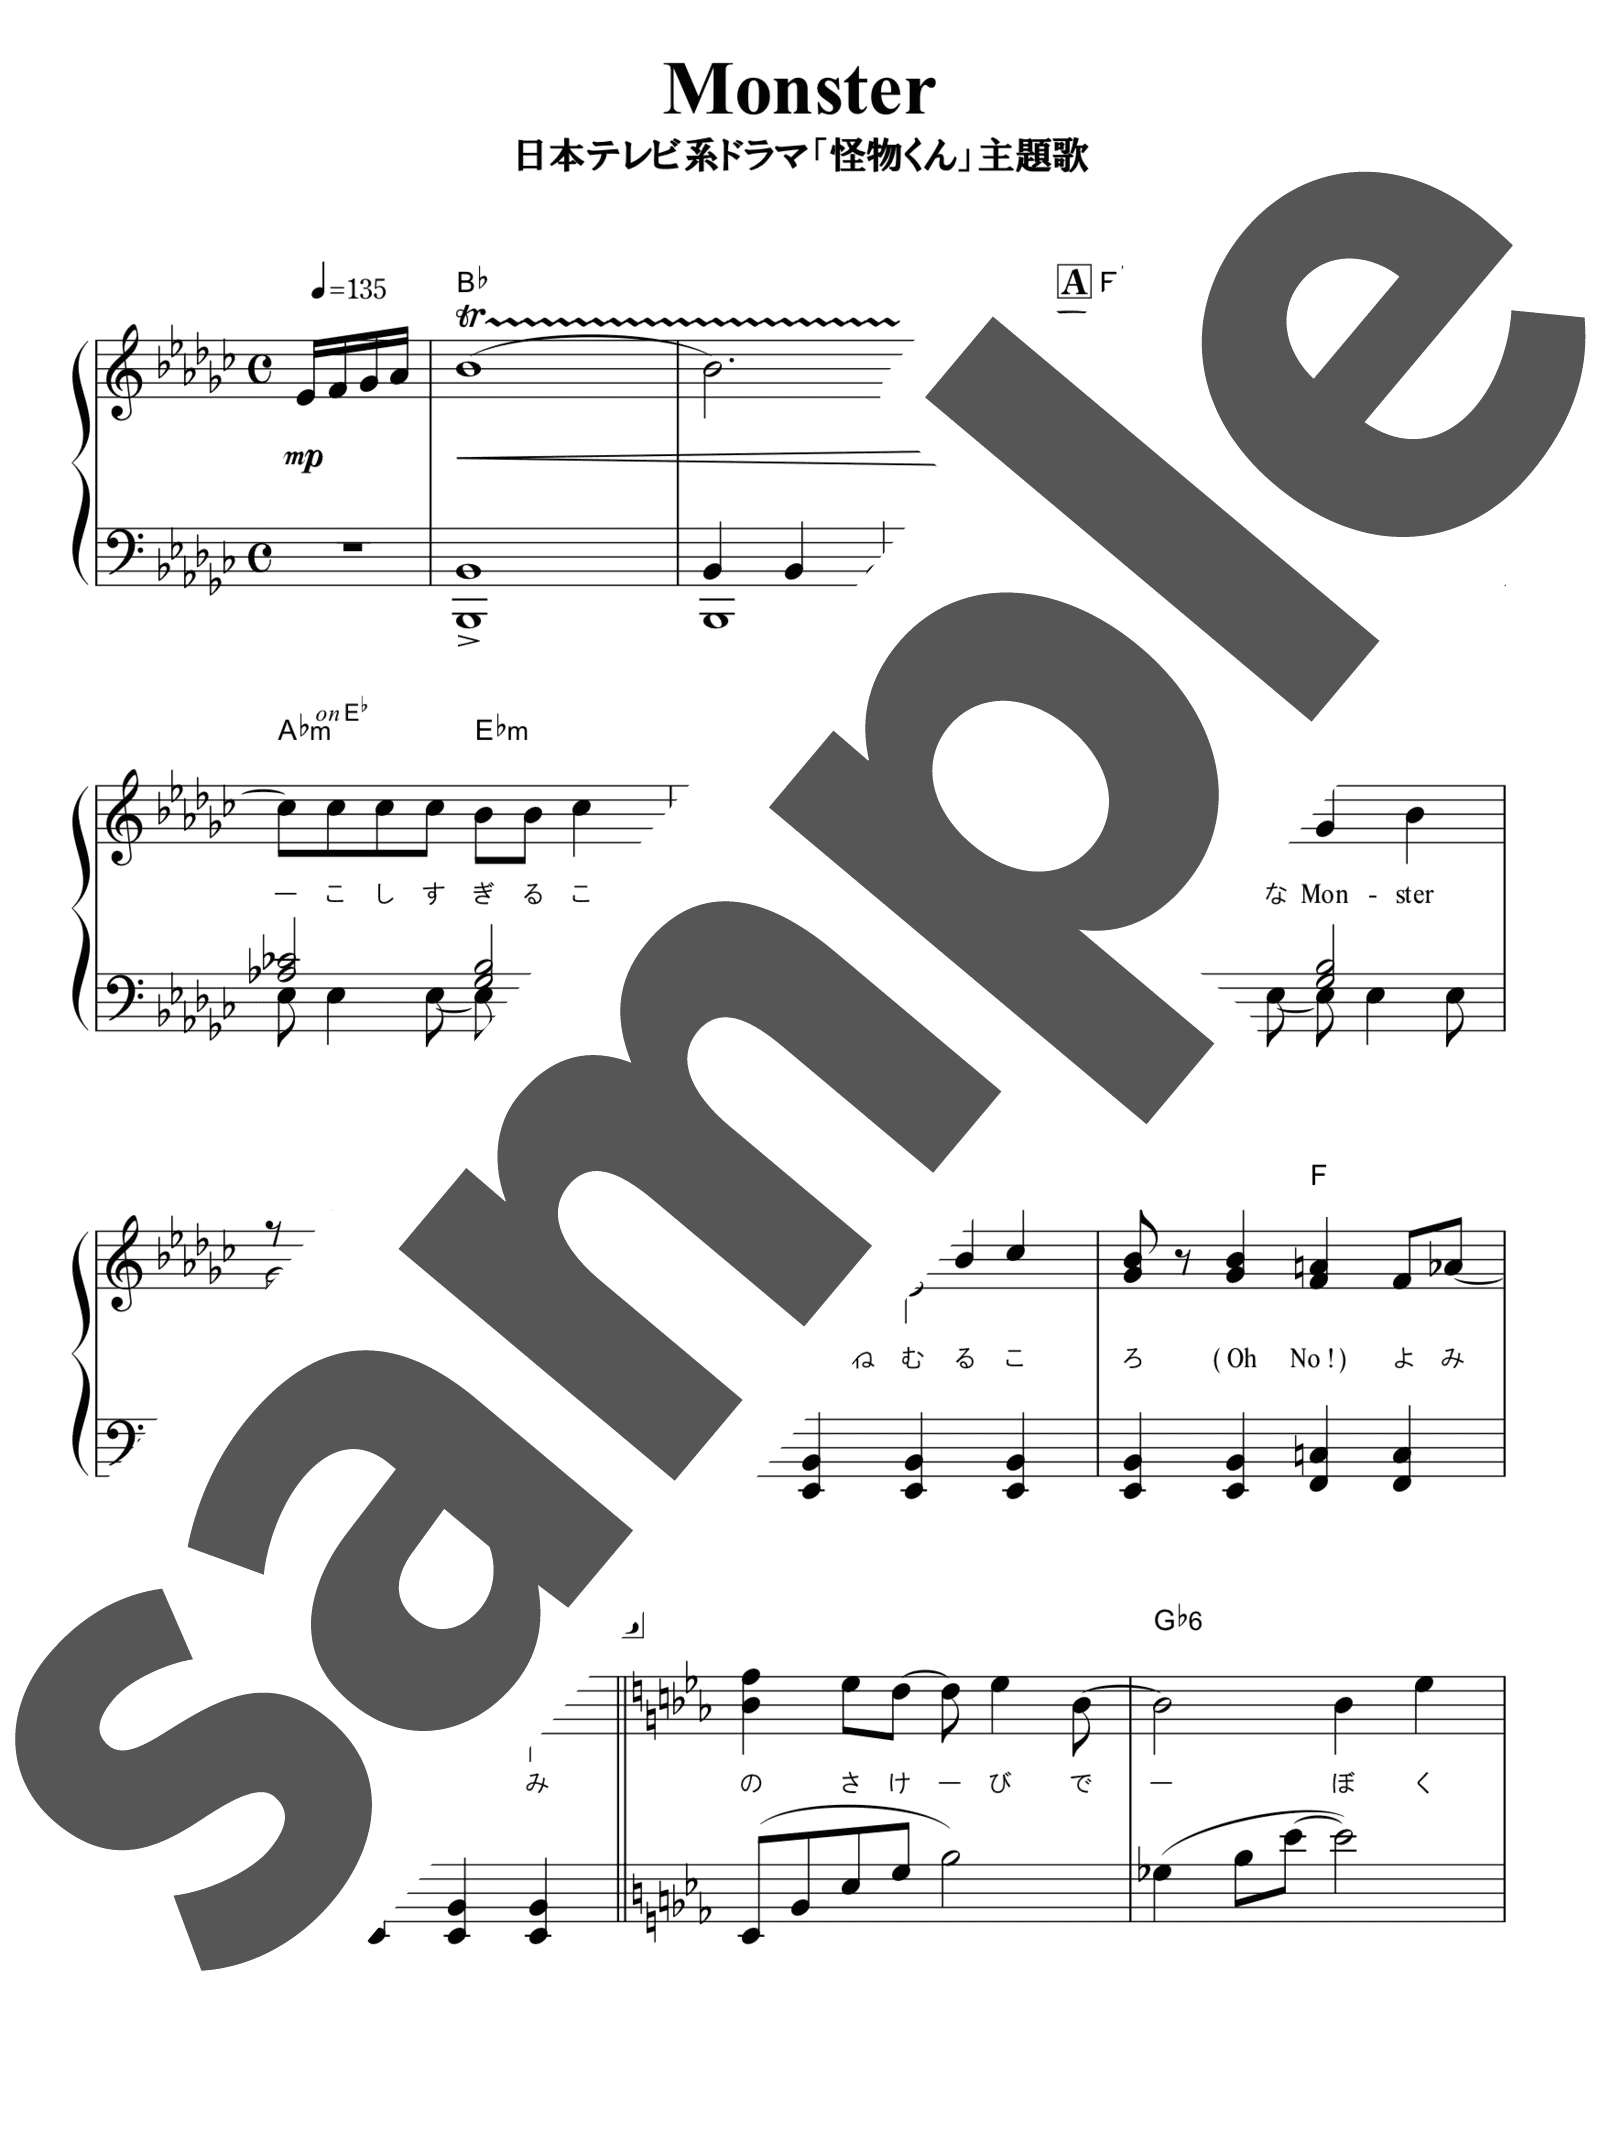 「Monster」のサンプル楽譜